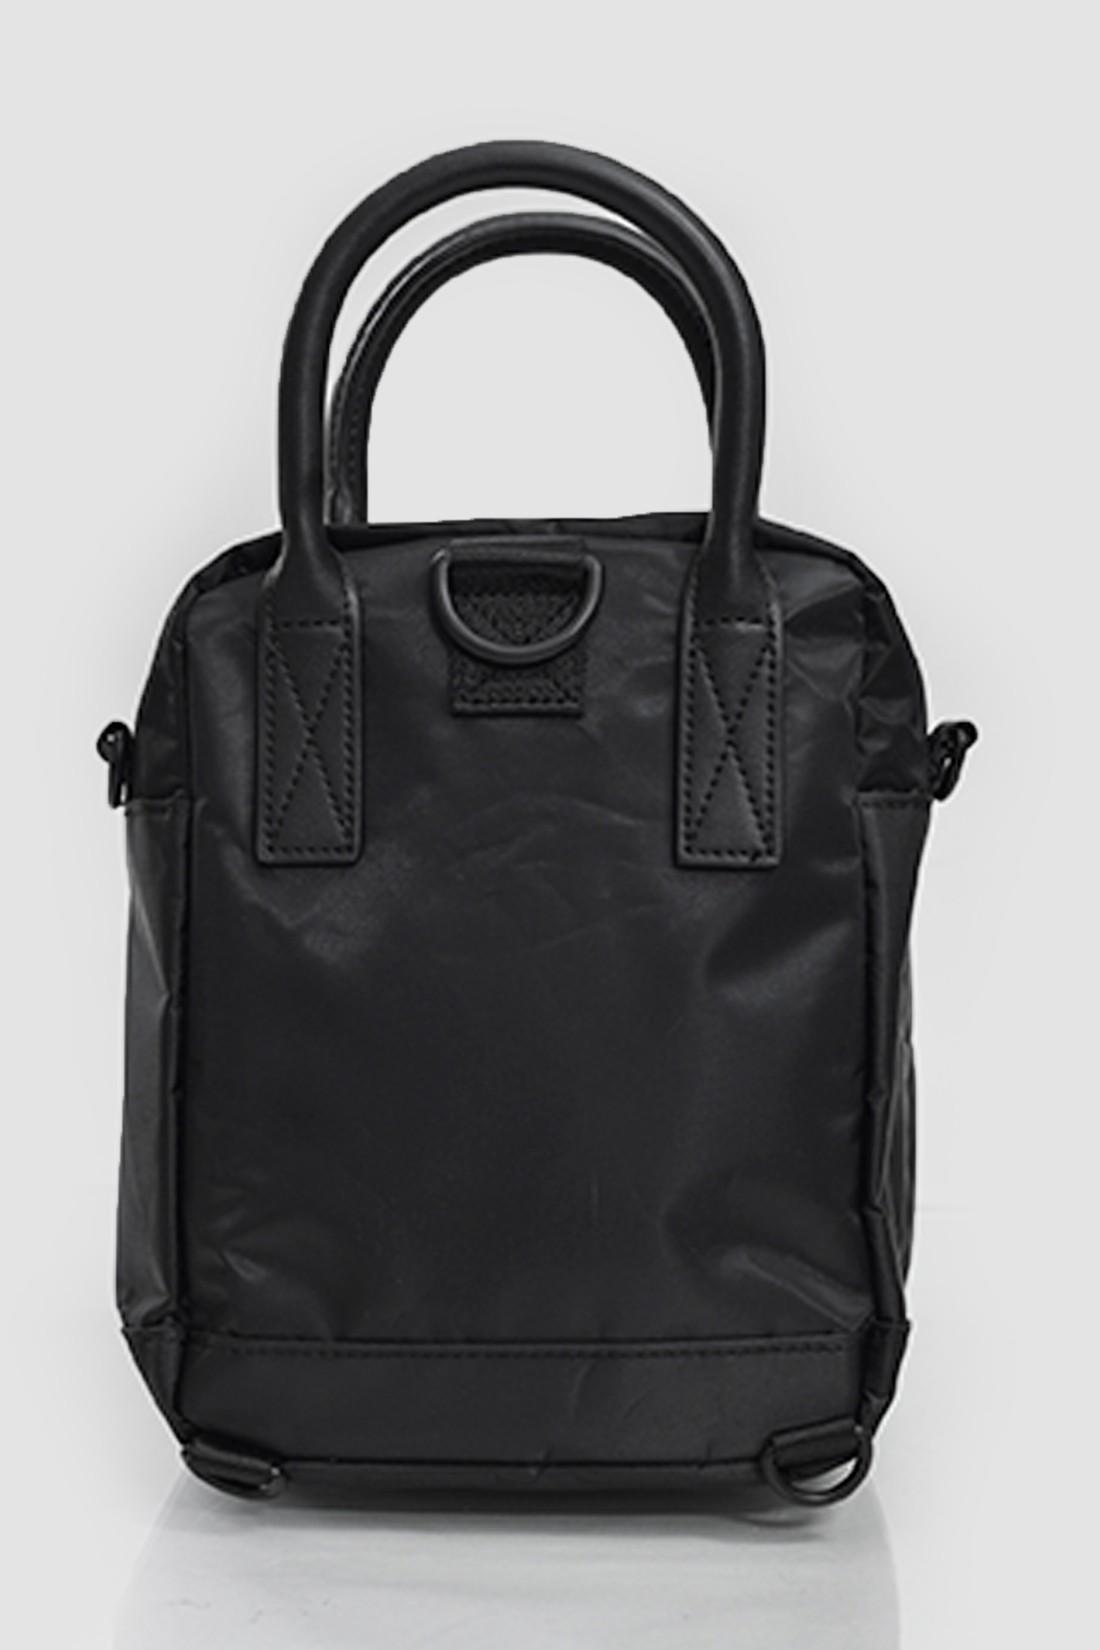 Bolsa Colcci Camera Bag Nylon